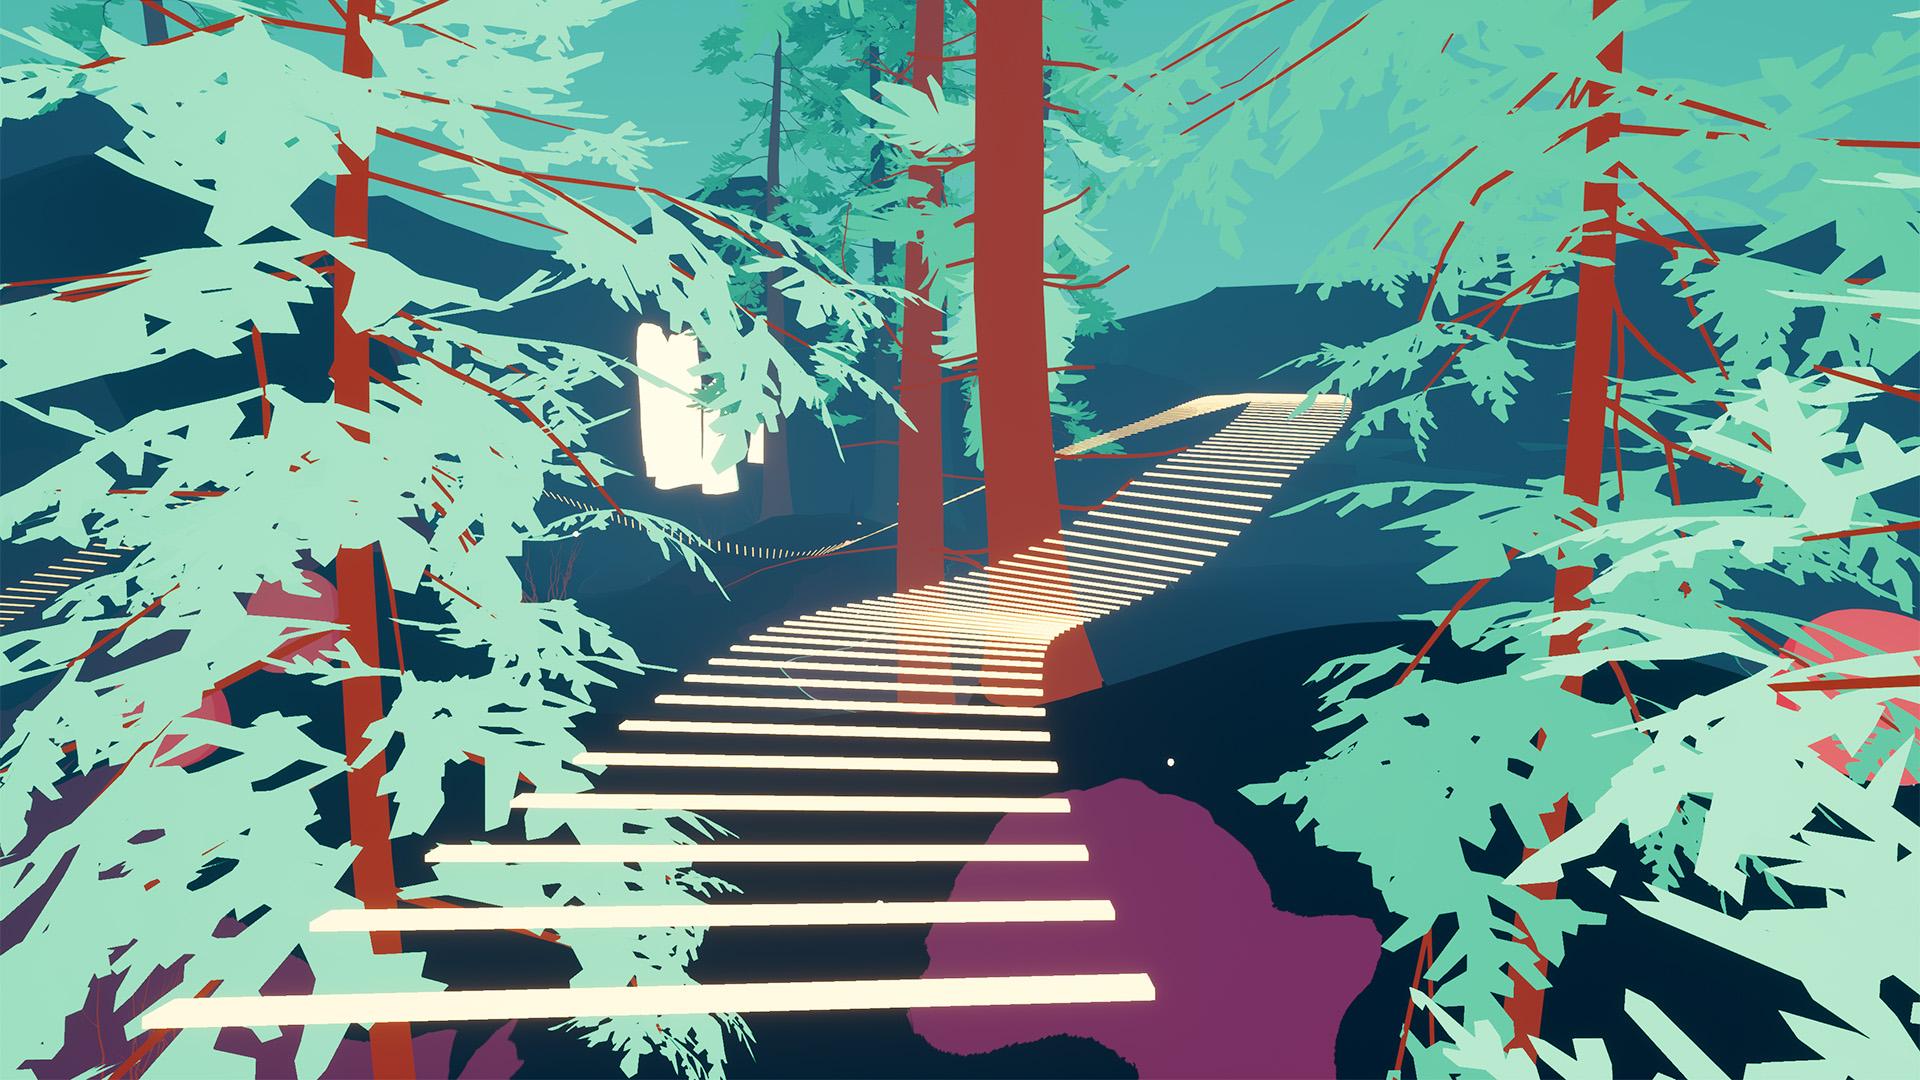 ForestBoardwalk_1920x1080.jpg